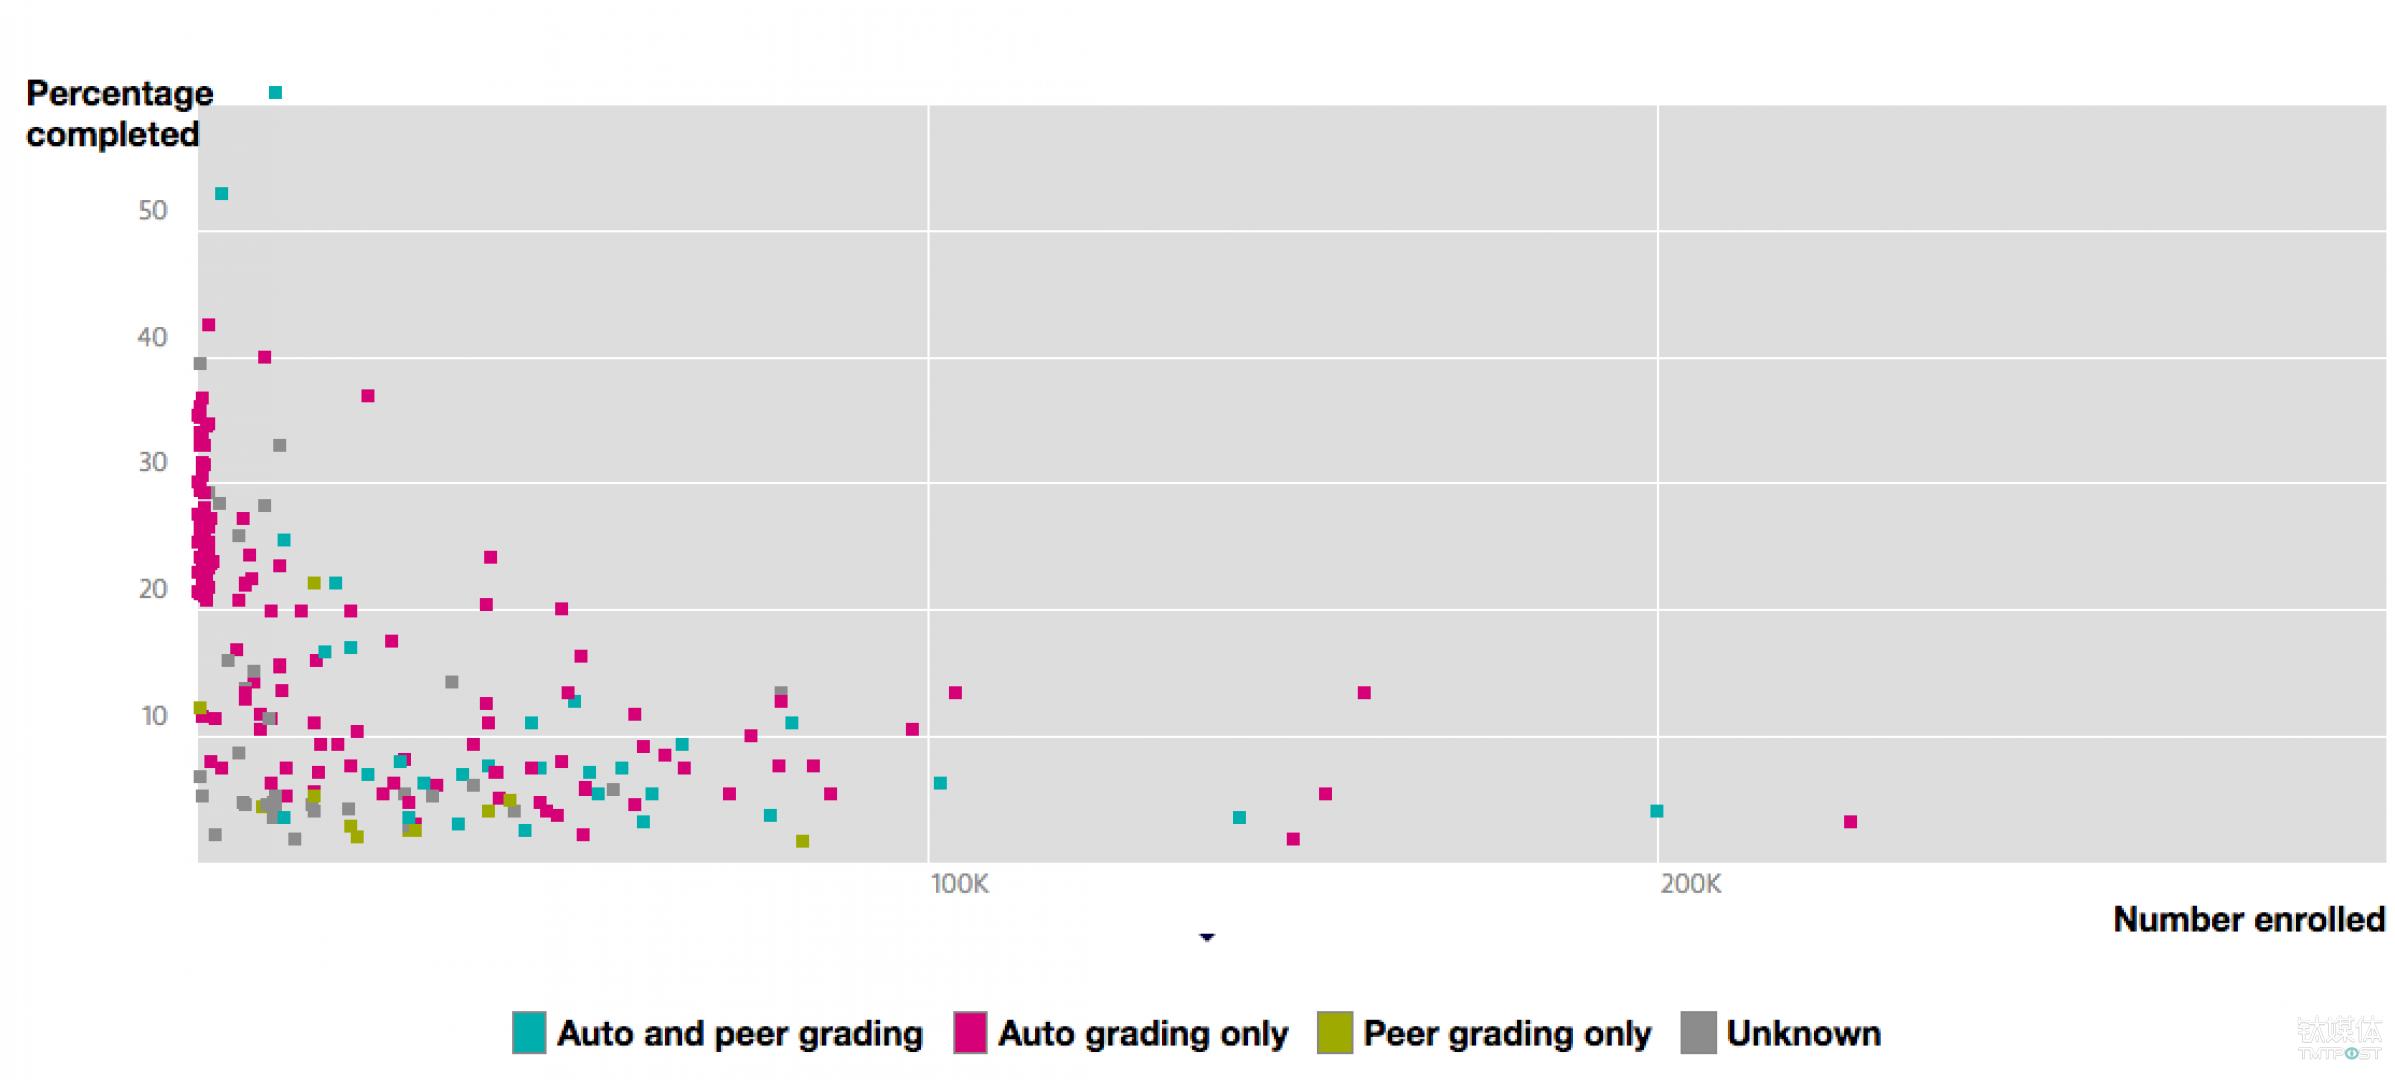 MOOC 的完成率不容乐观 来源:katyjordan